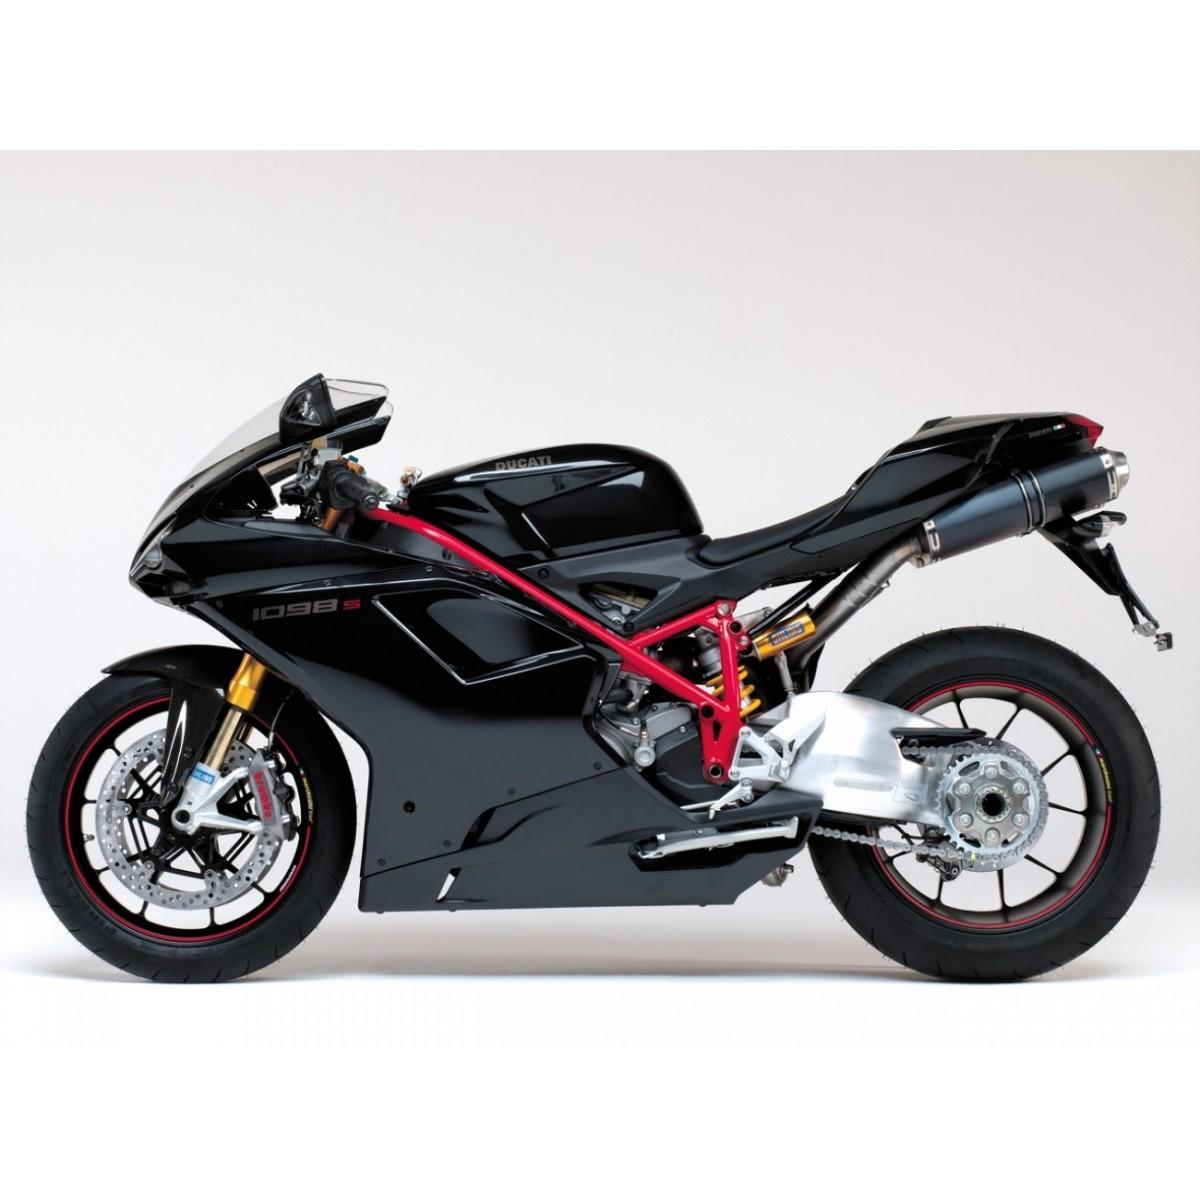 Kit Adesivos Ducati 1098s Preta Decalx